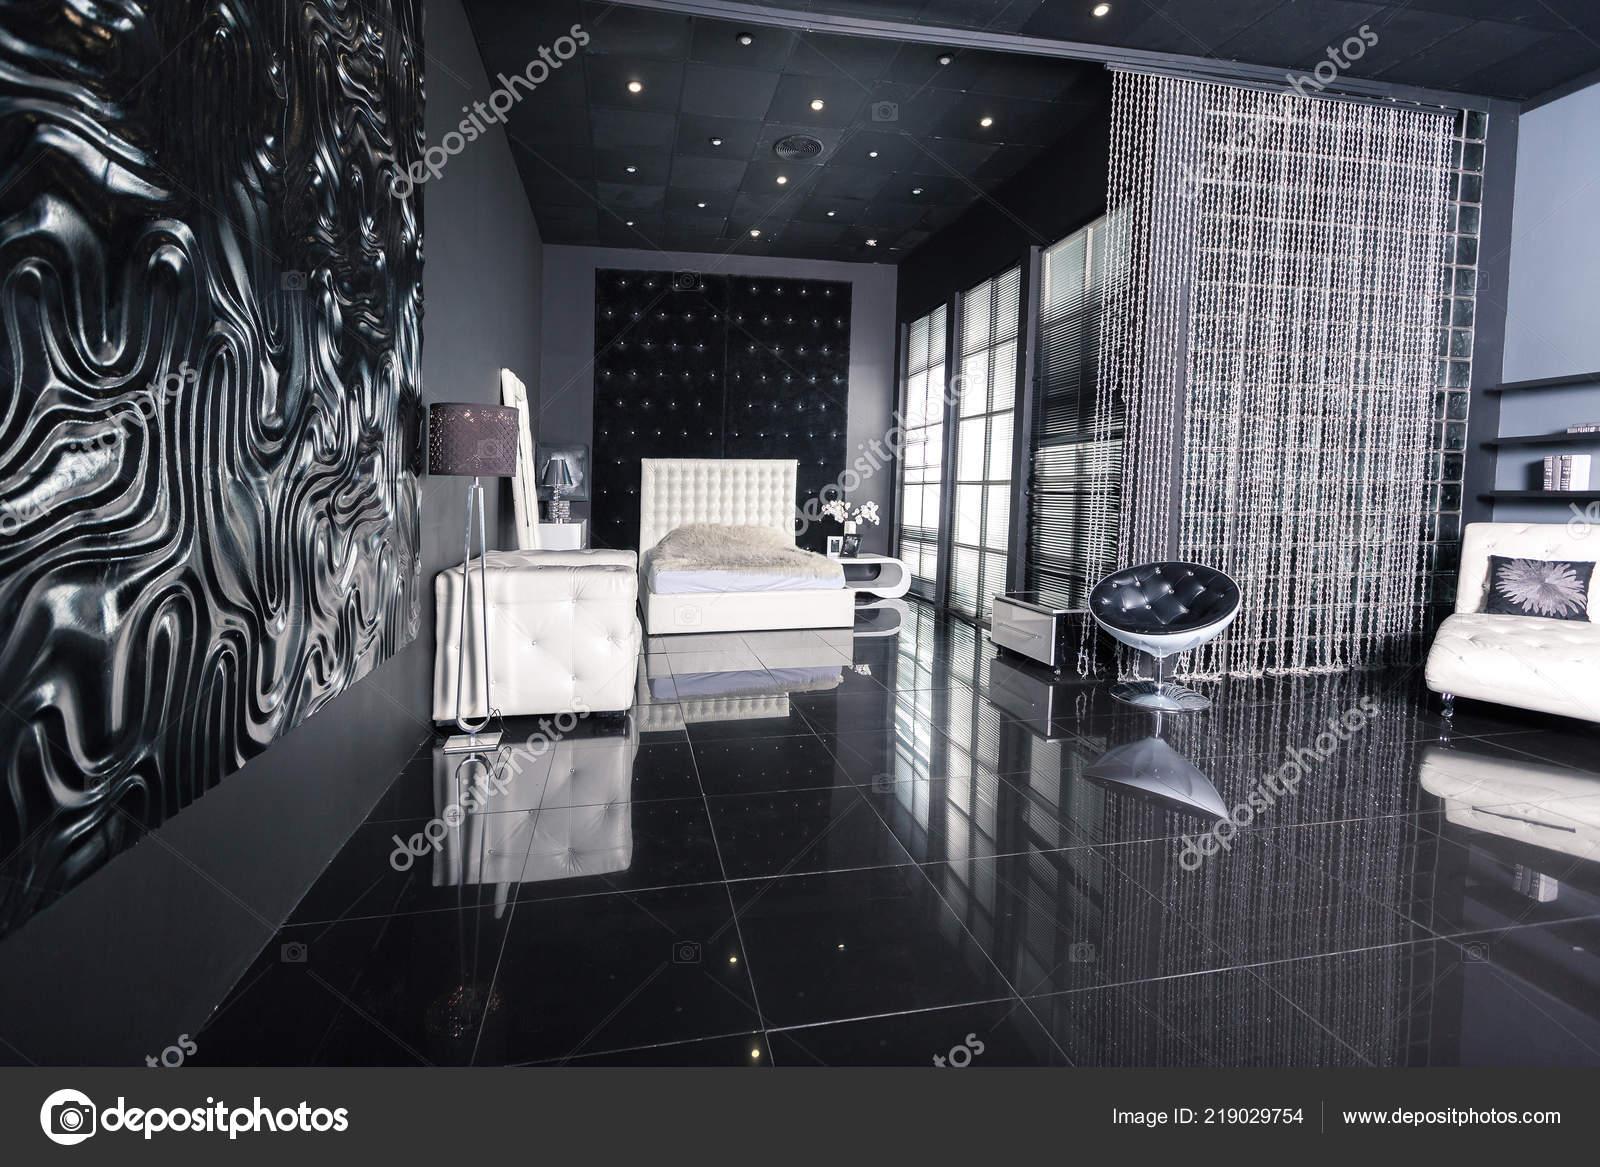 Stylish Luxury Bedroom Interior Design Dark Walls Modern Light Furniture Stock Photo C Nokia Alexnet 219029754